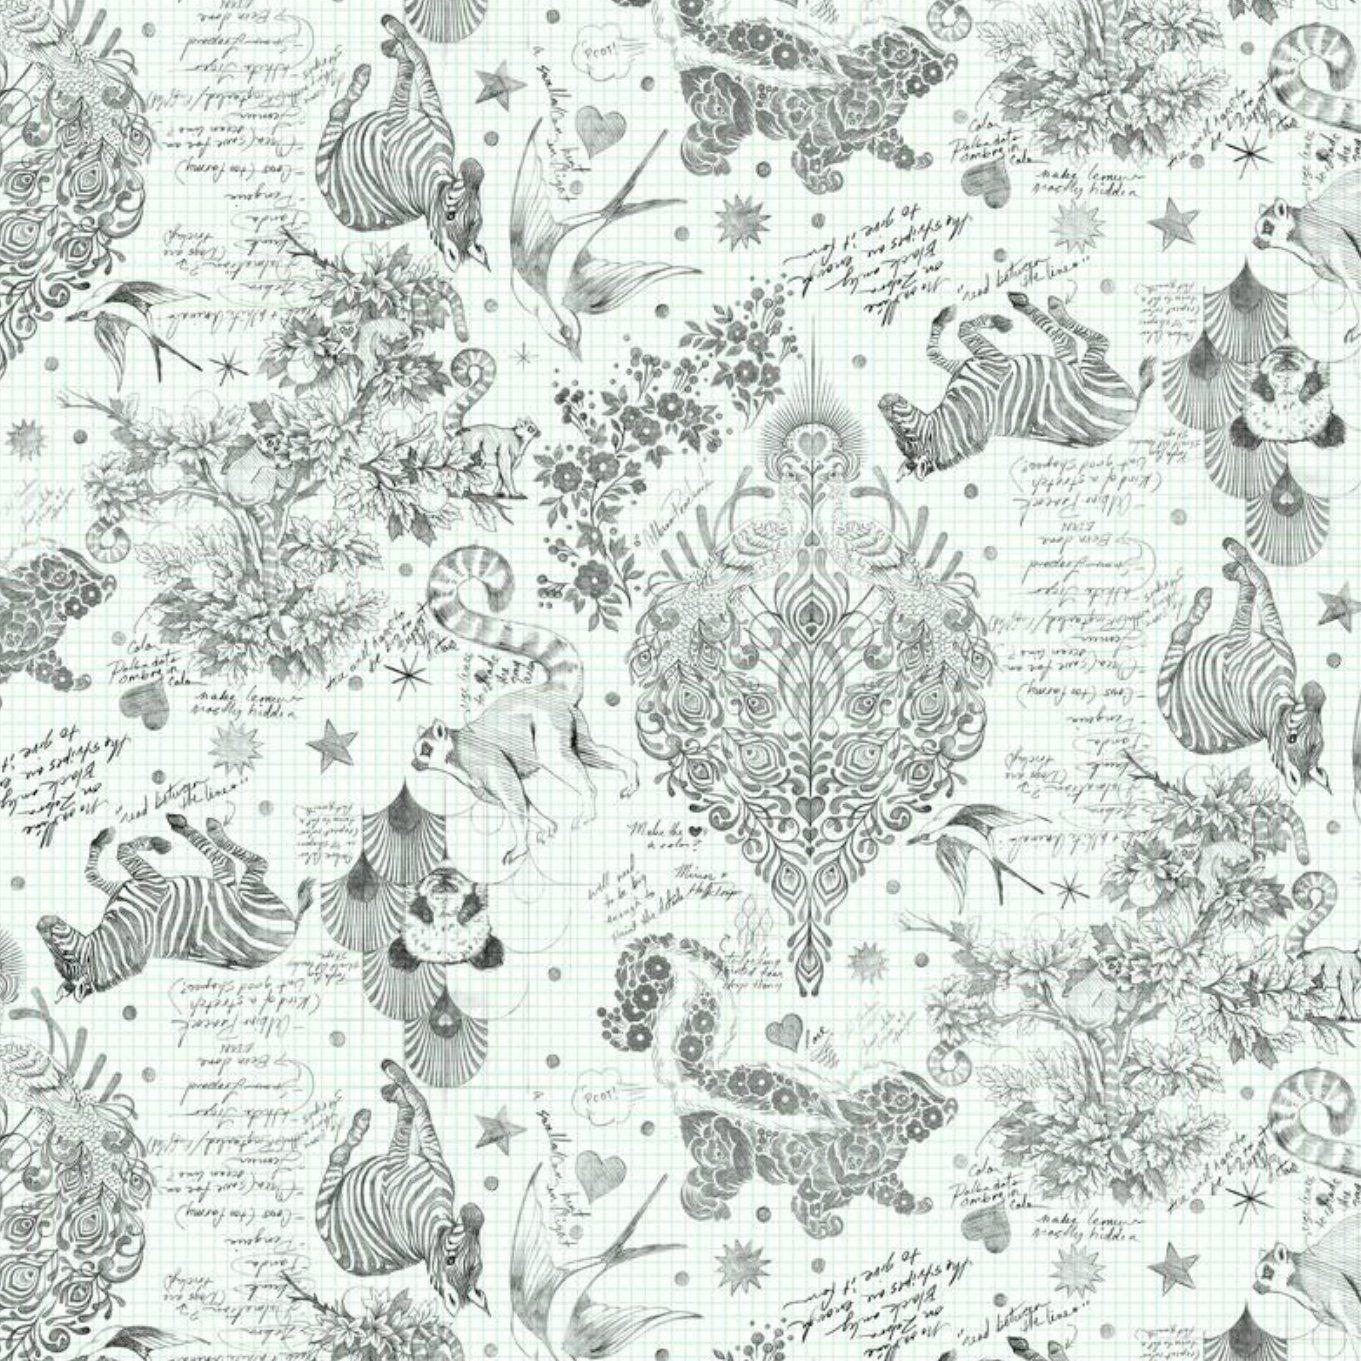 Tula Pink Linework PWTP158.Paper Sketchy Free Spirit